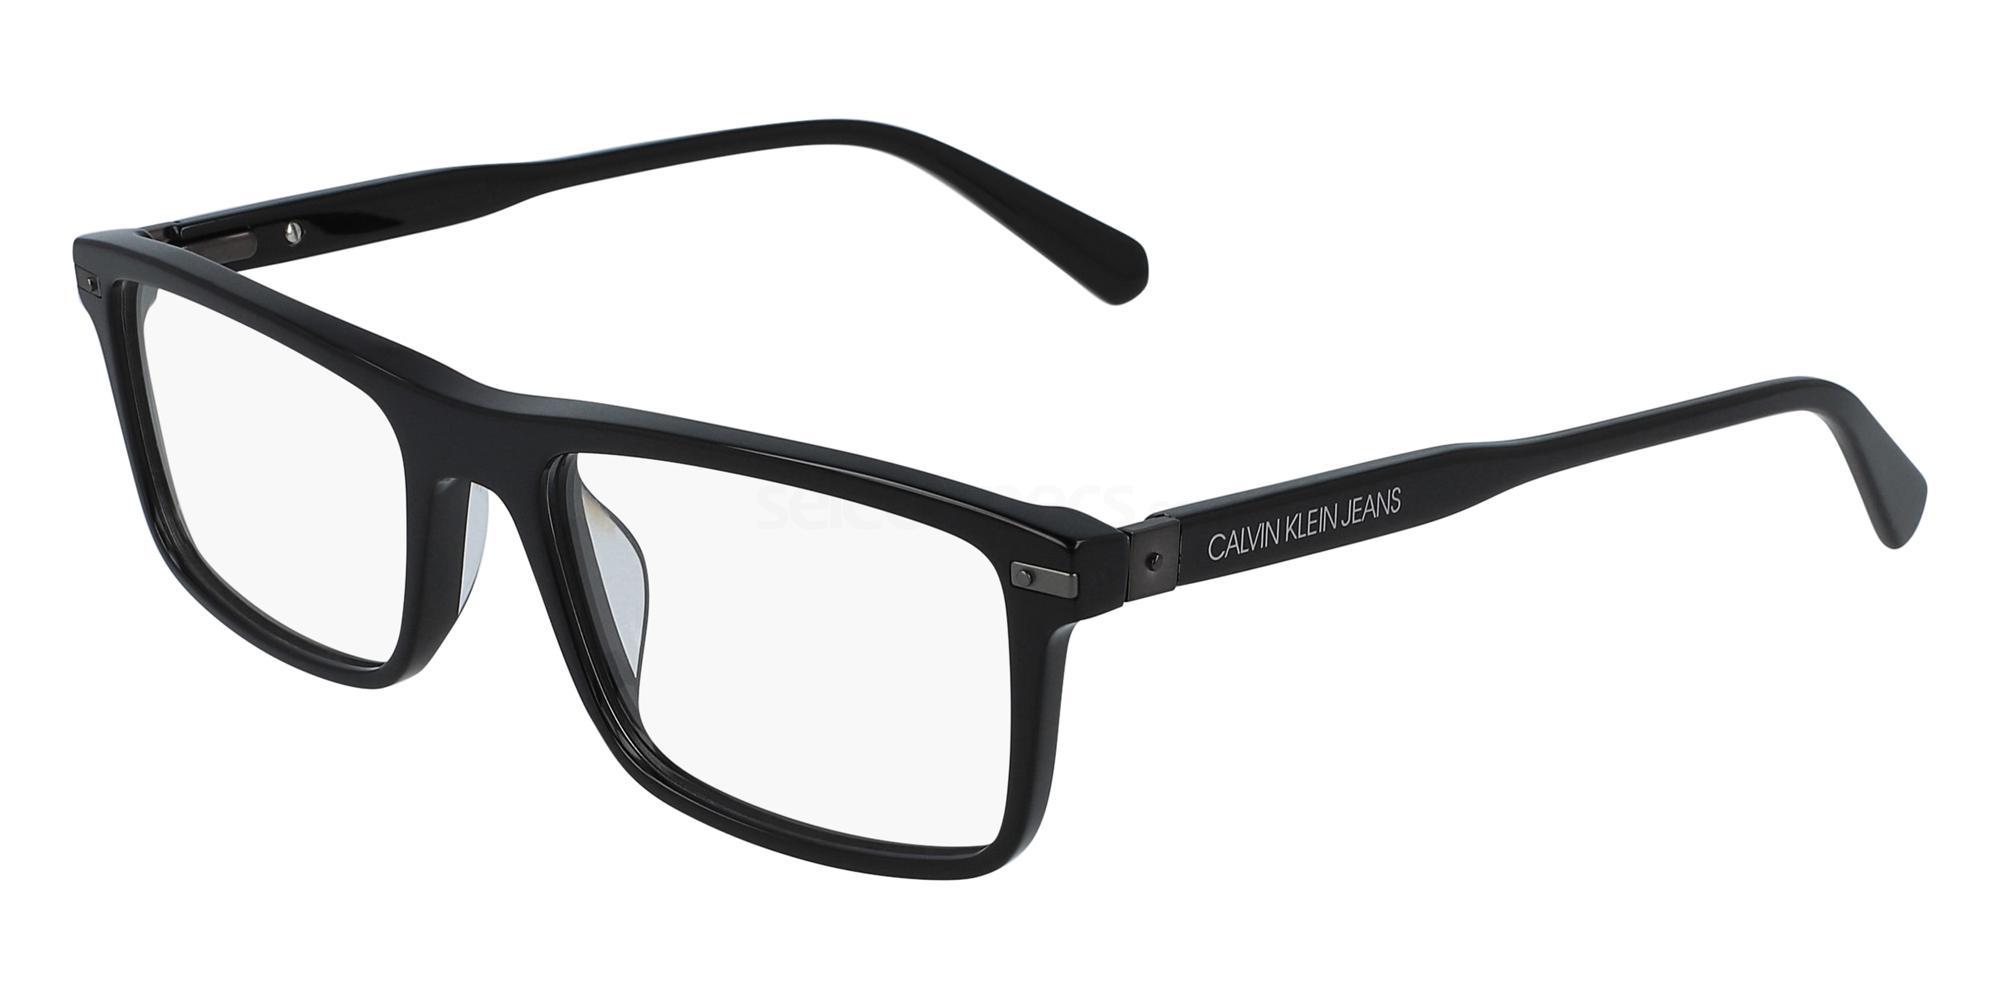 001 CKJ19526 Glasses, Calvin Klein Jeans